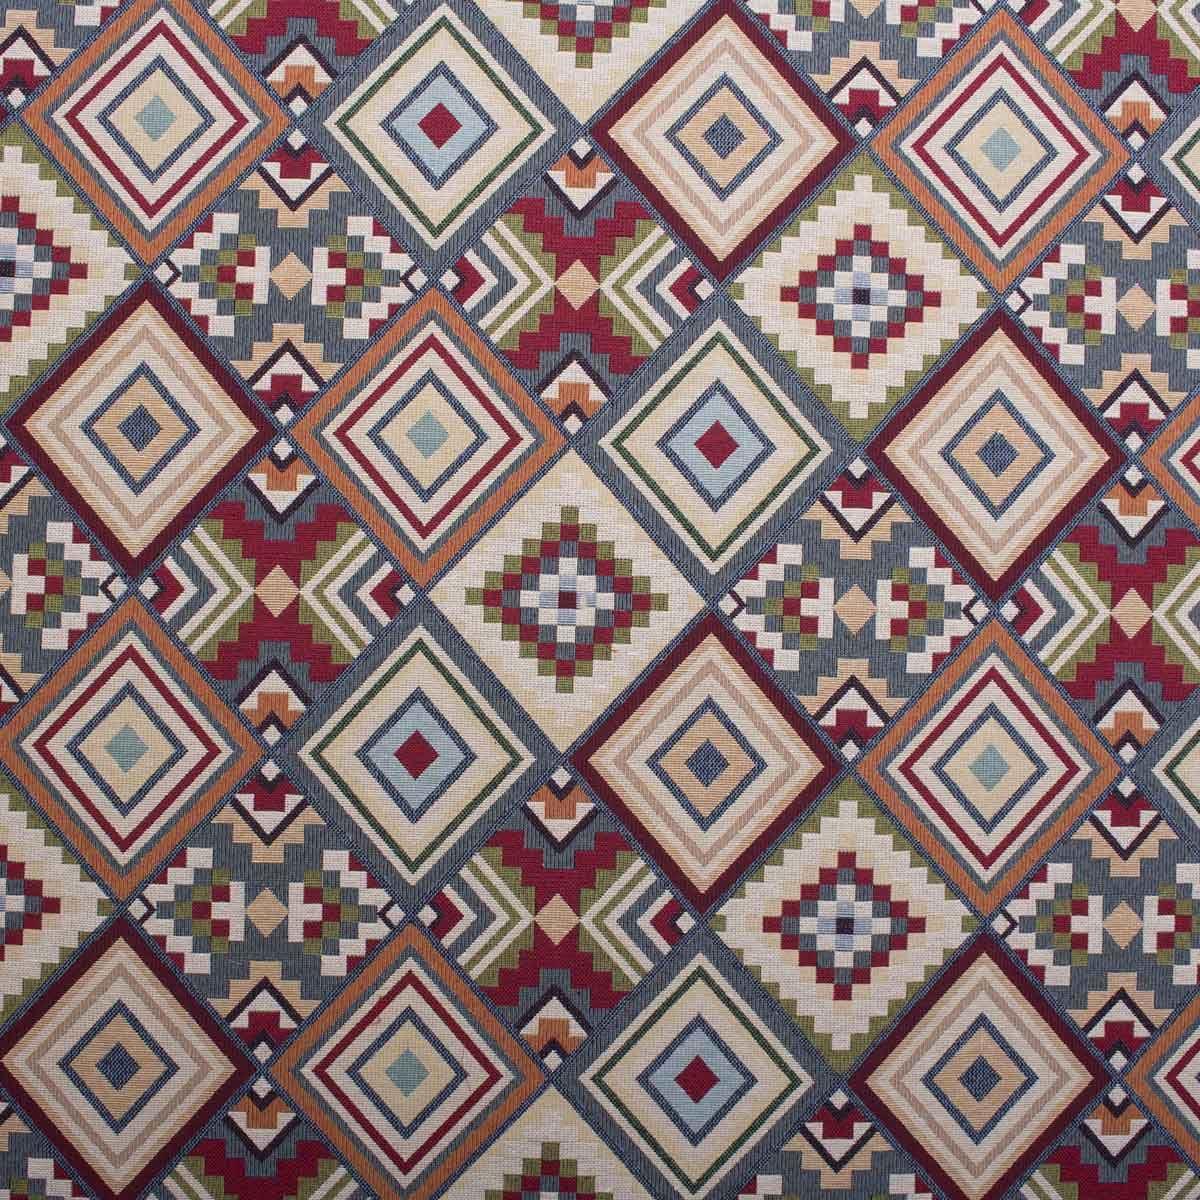 world of azt que clair tapisserie motif g om trique tapisserie rideau tissu ebay. Black Bedroom Furniture Sets. Home Design Ideas